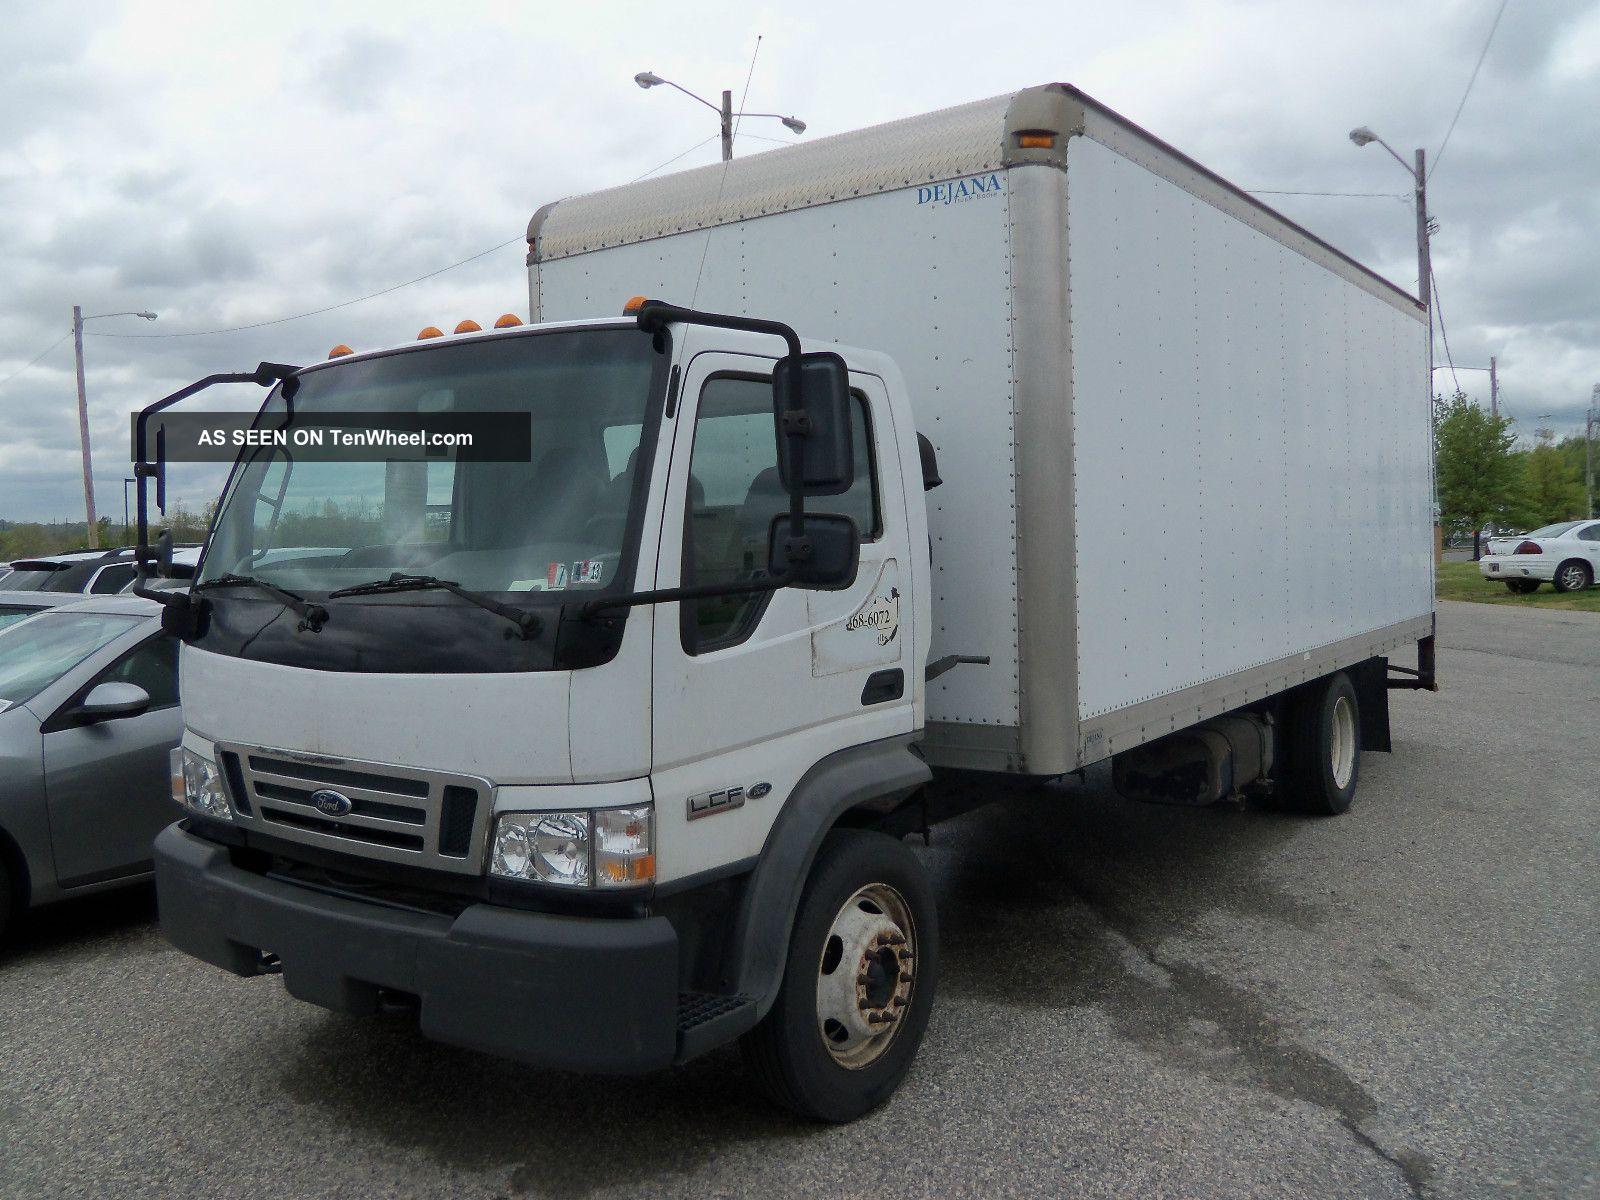 hight resolution of 2007 ford lcf box truck freightliner alternator wiring 2007 ford lcf wiring